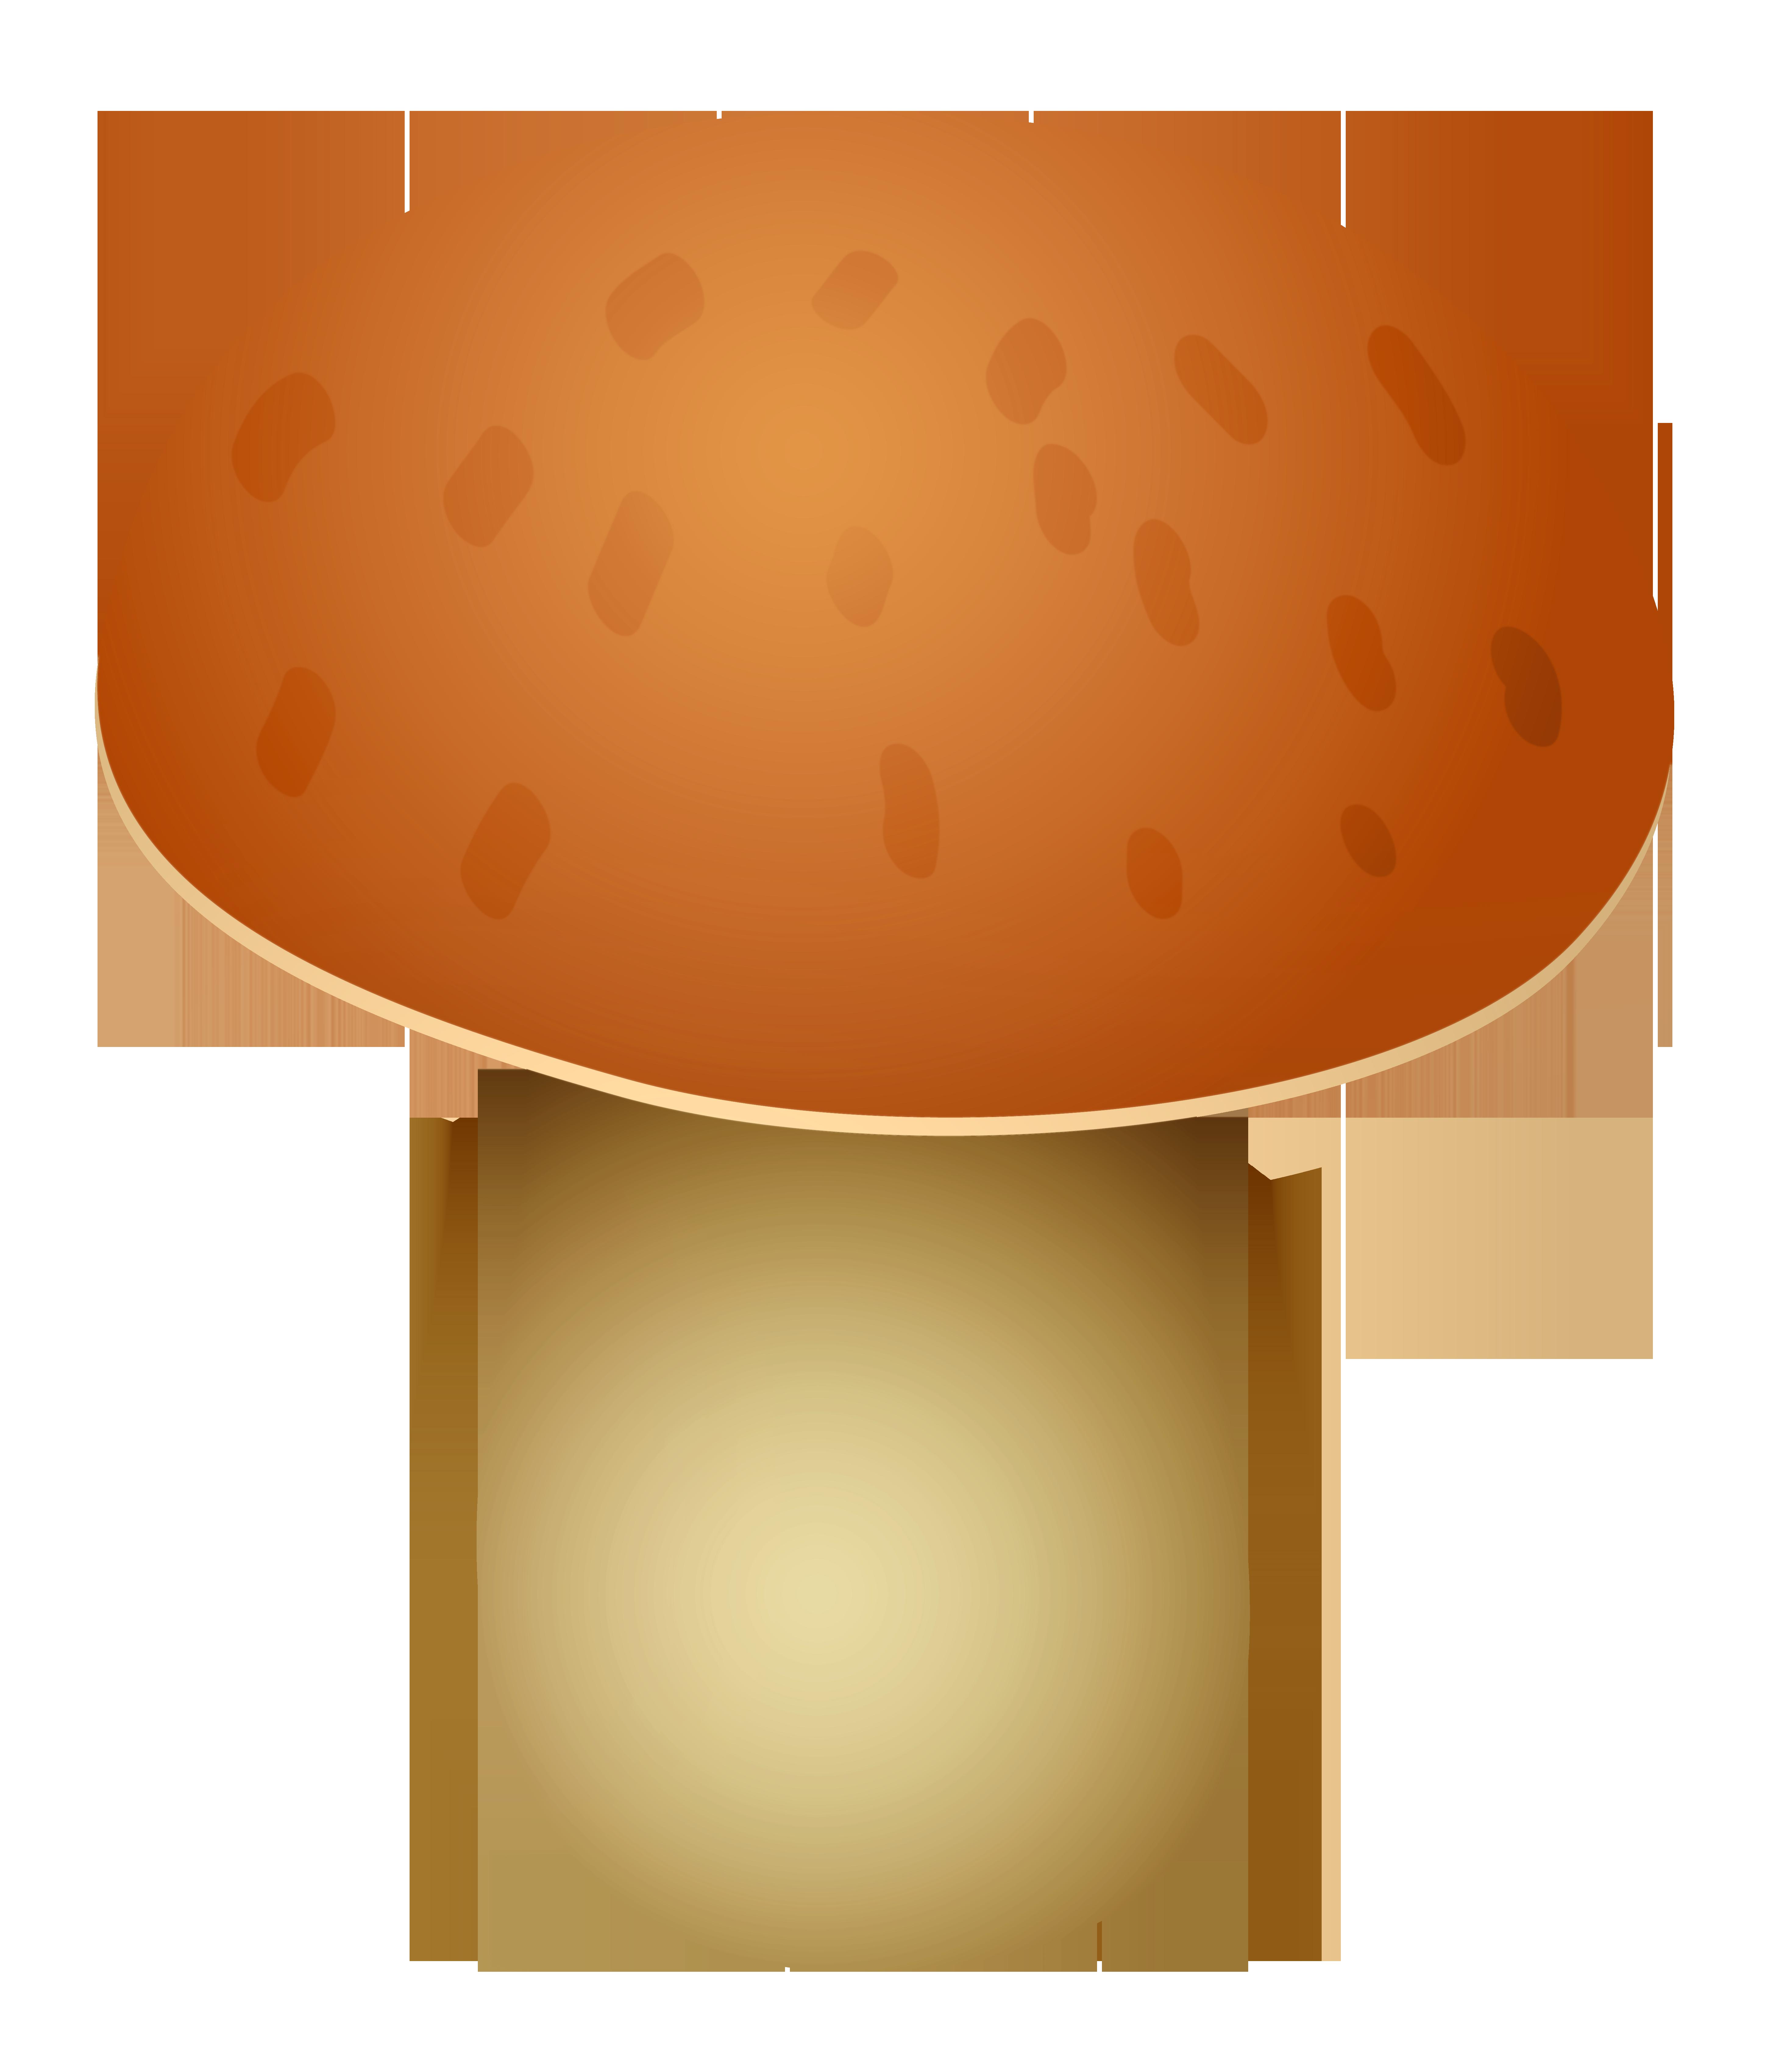 Spotted png best web. Mushrooms clipart brown mushroom